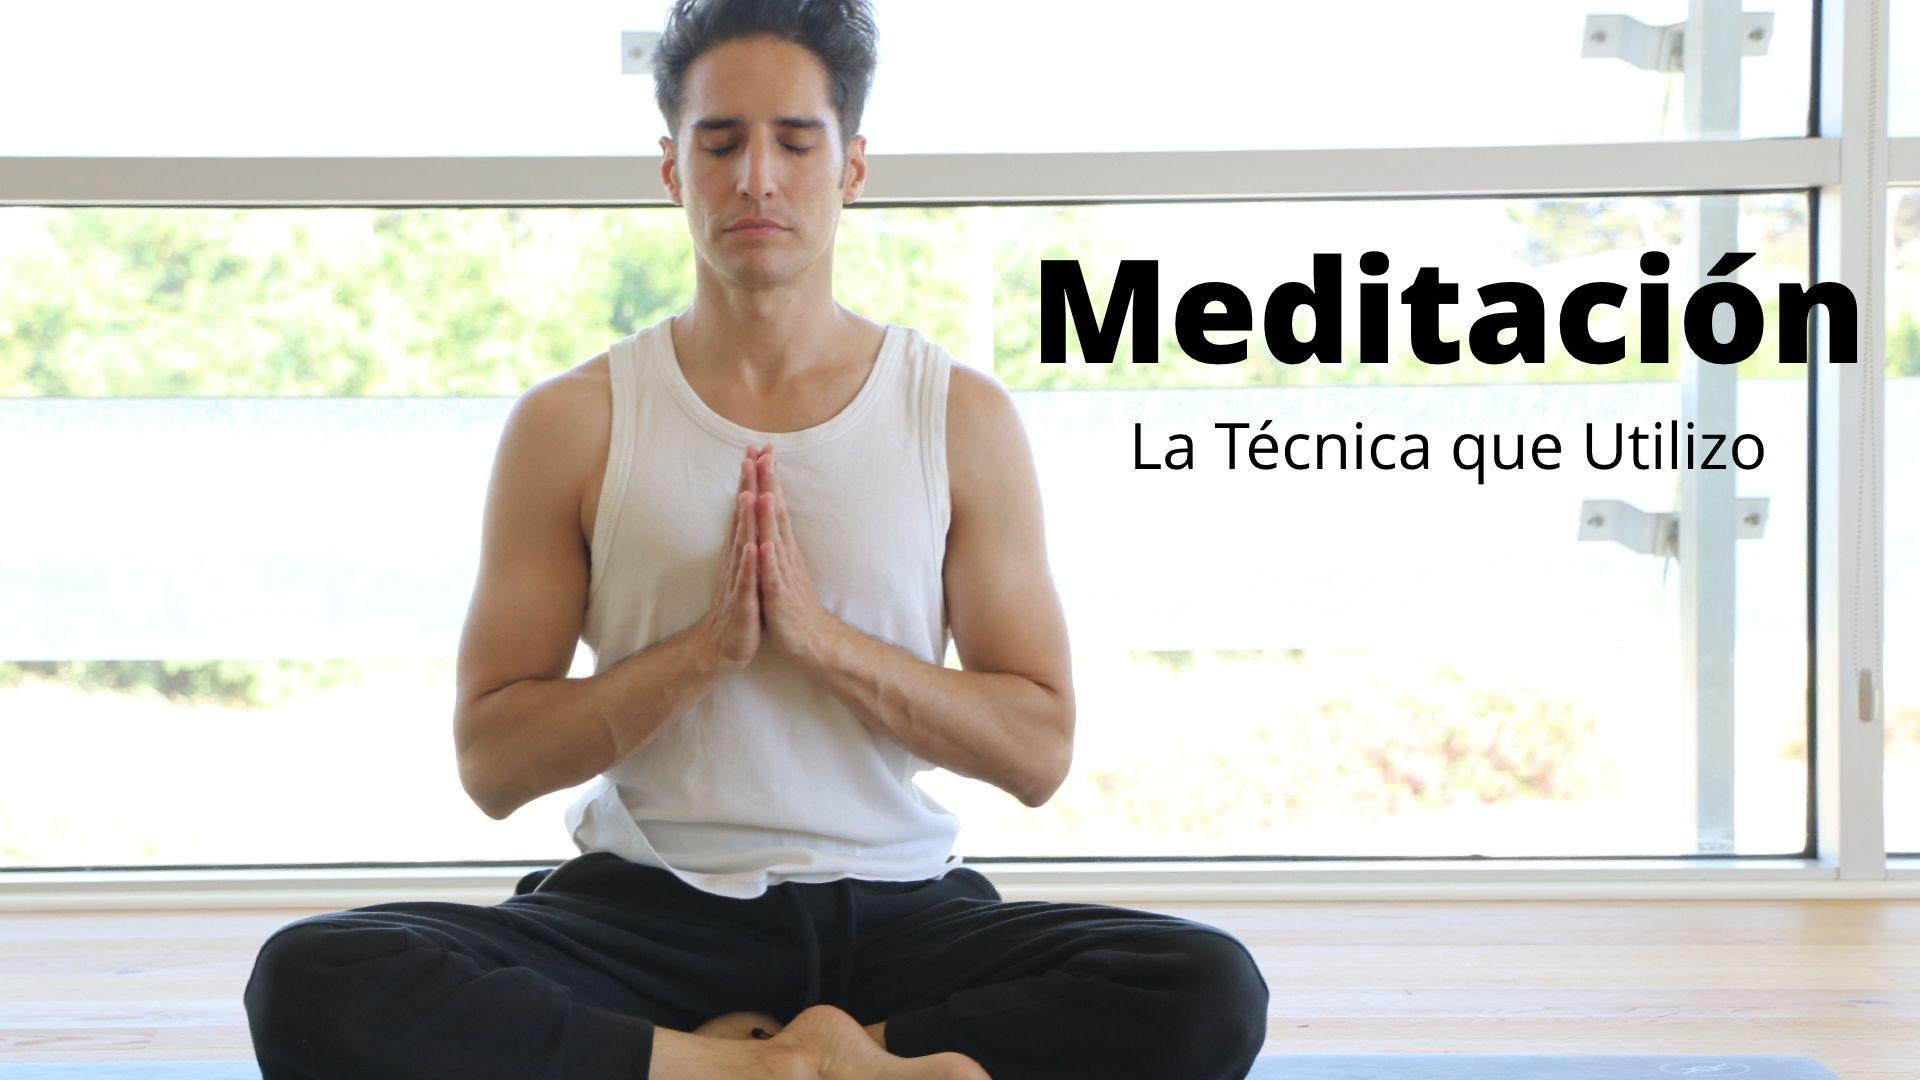 Agustin Vidal Meditacion Tecnica